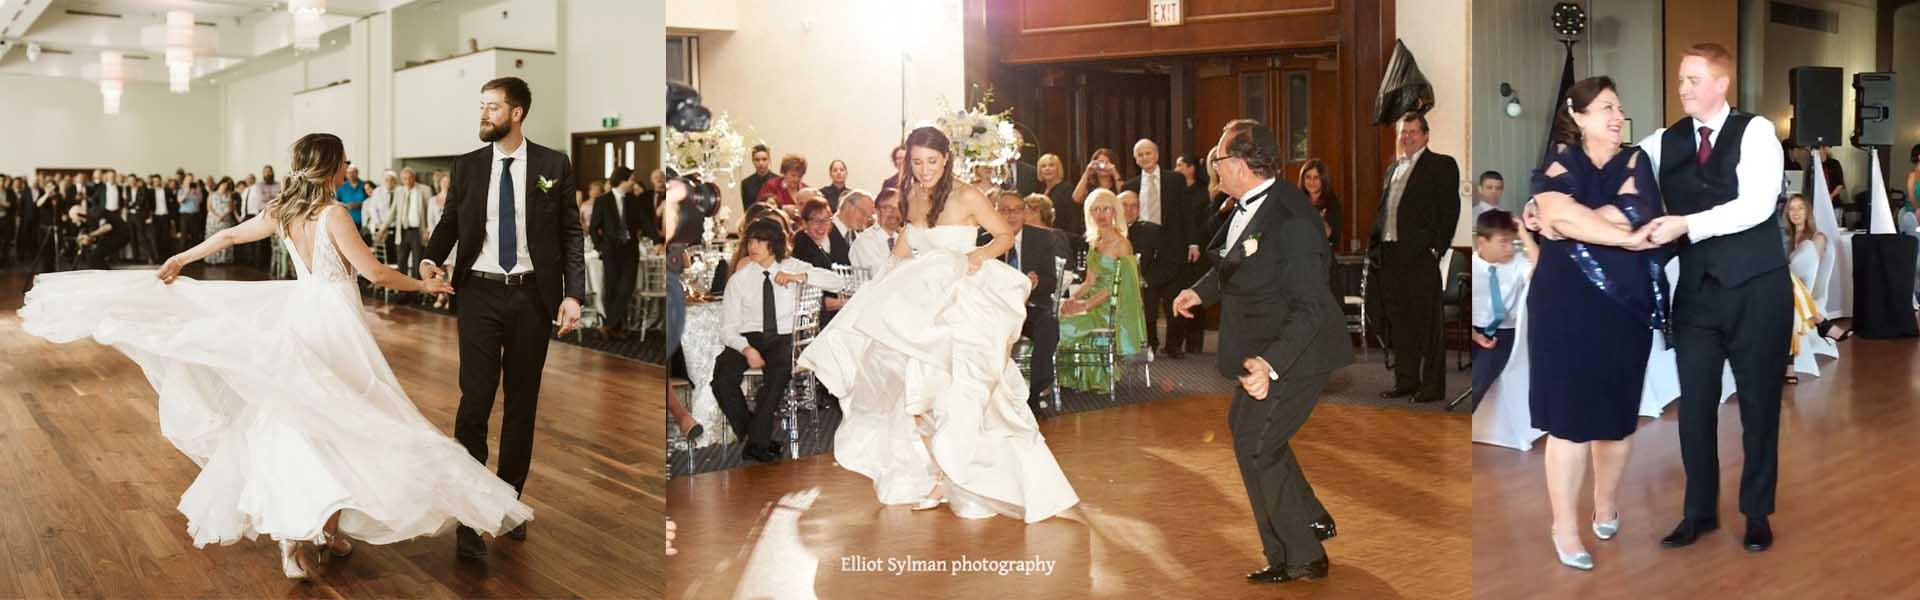 wedding dance choreogrpahy